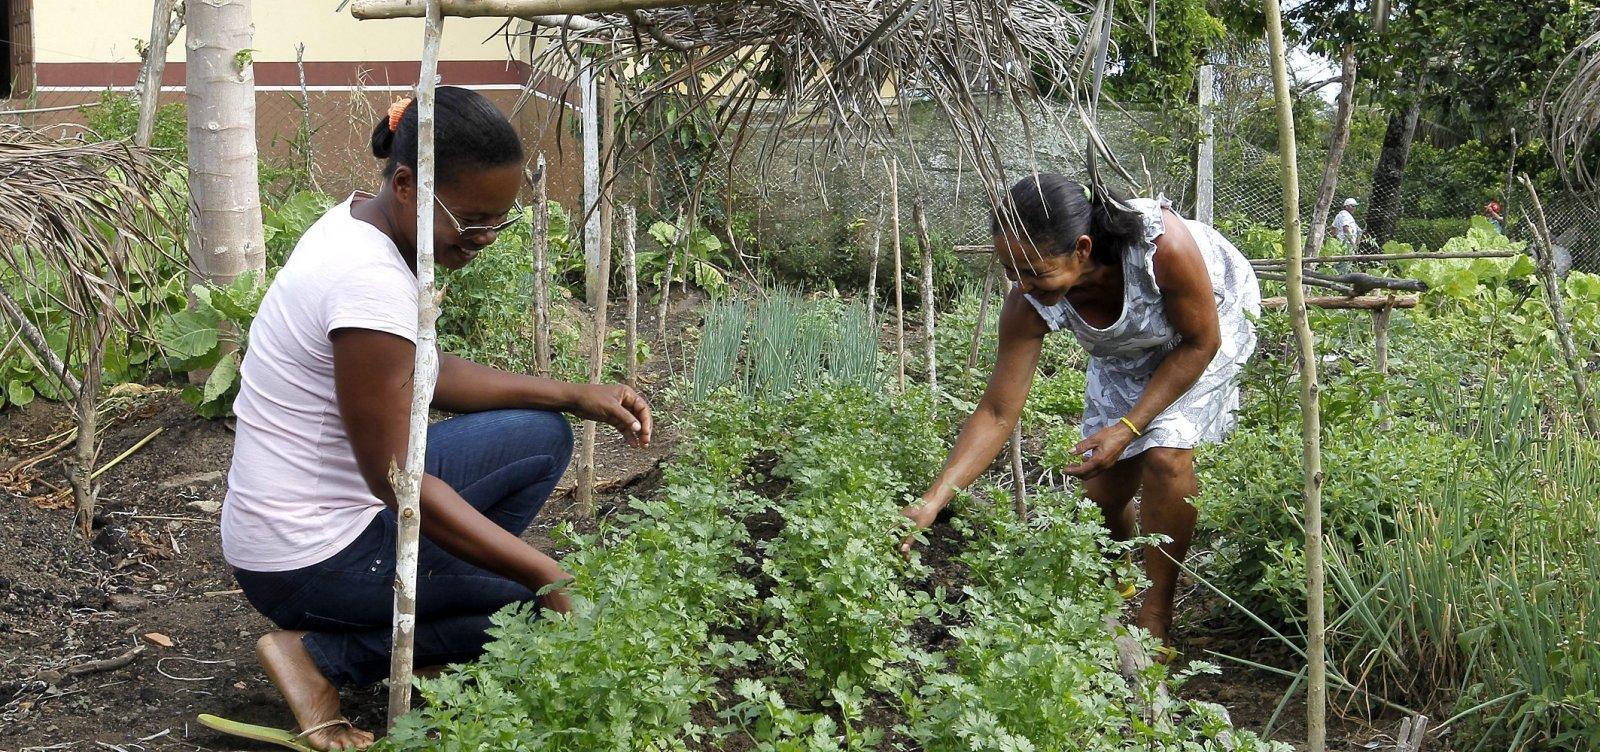 [Coronavírus: Governo da Bahia lança edital que destina R$ 15 mi a agricultores familiares]